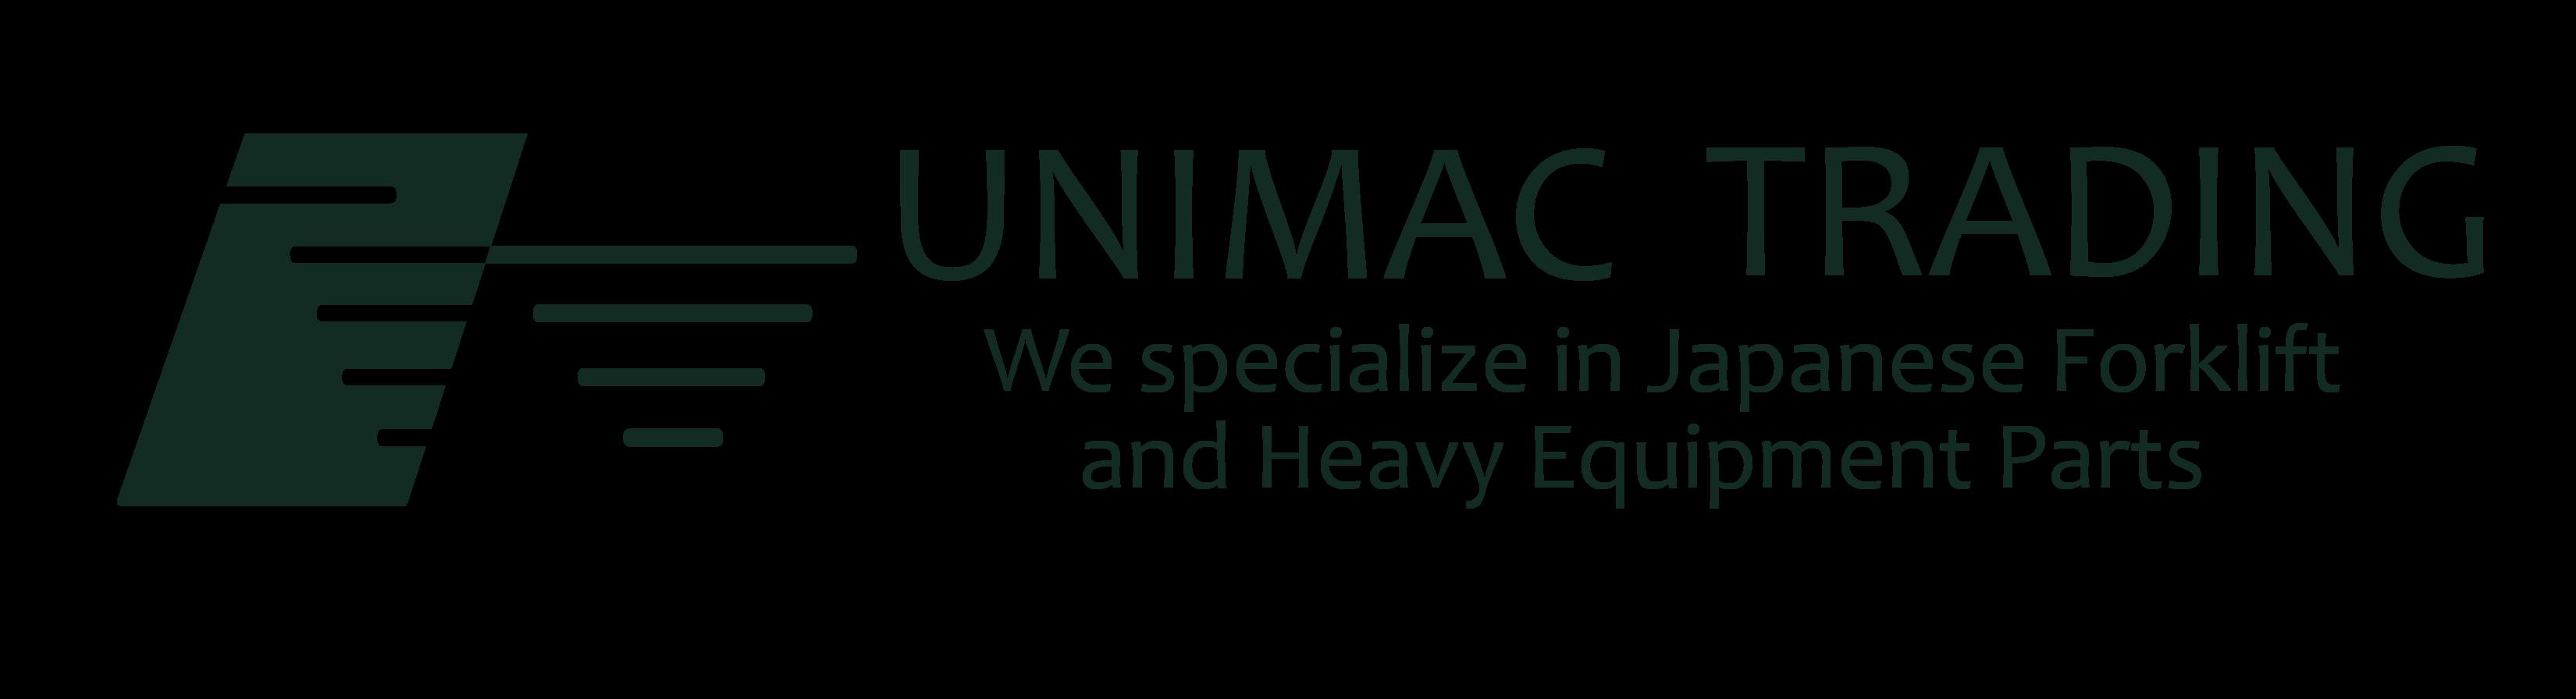 Unimac Trading